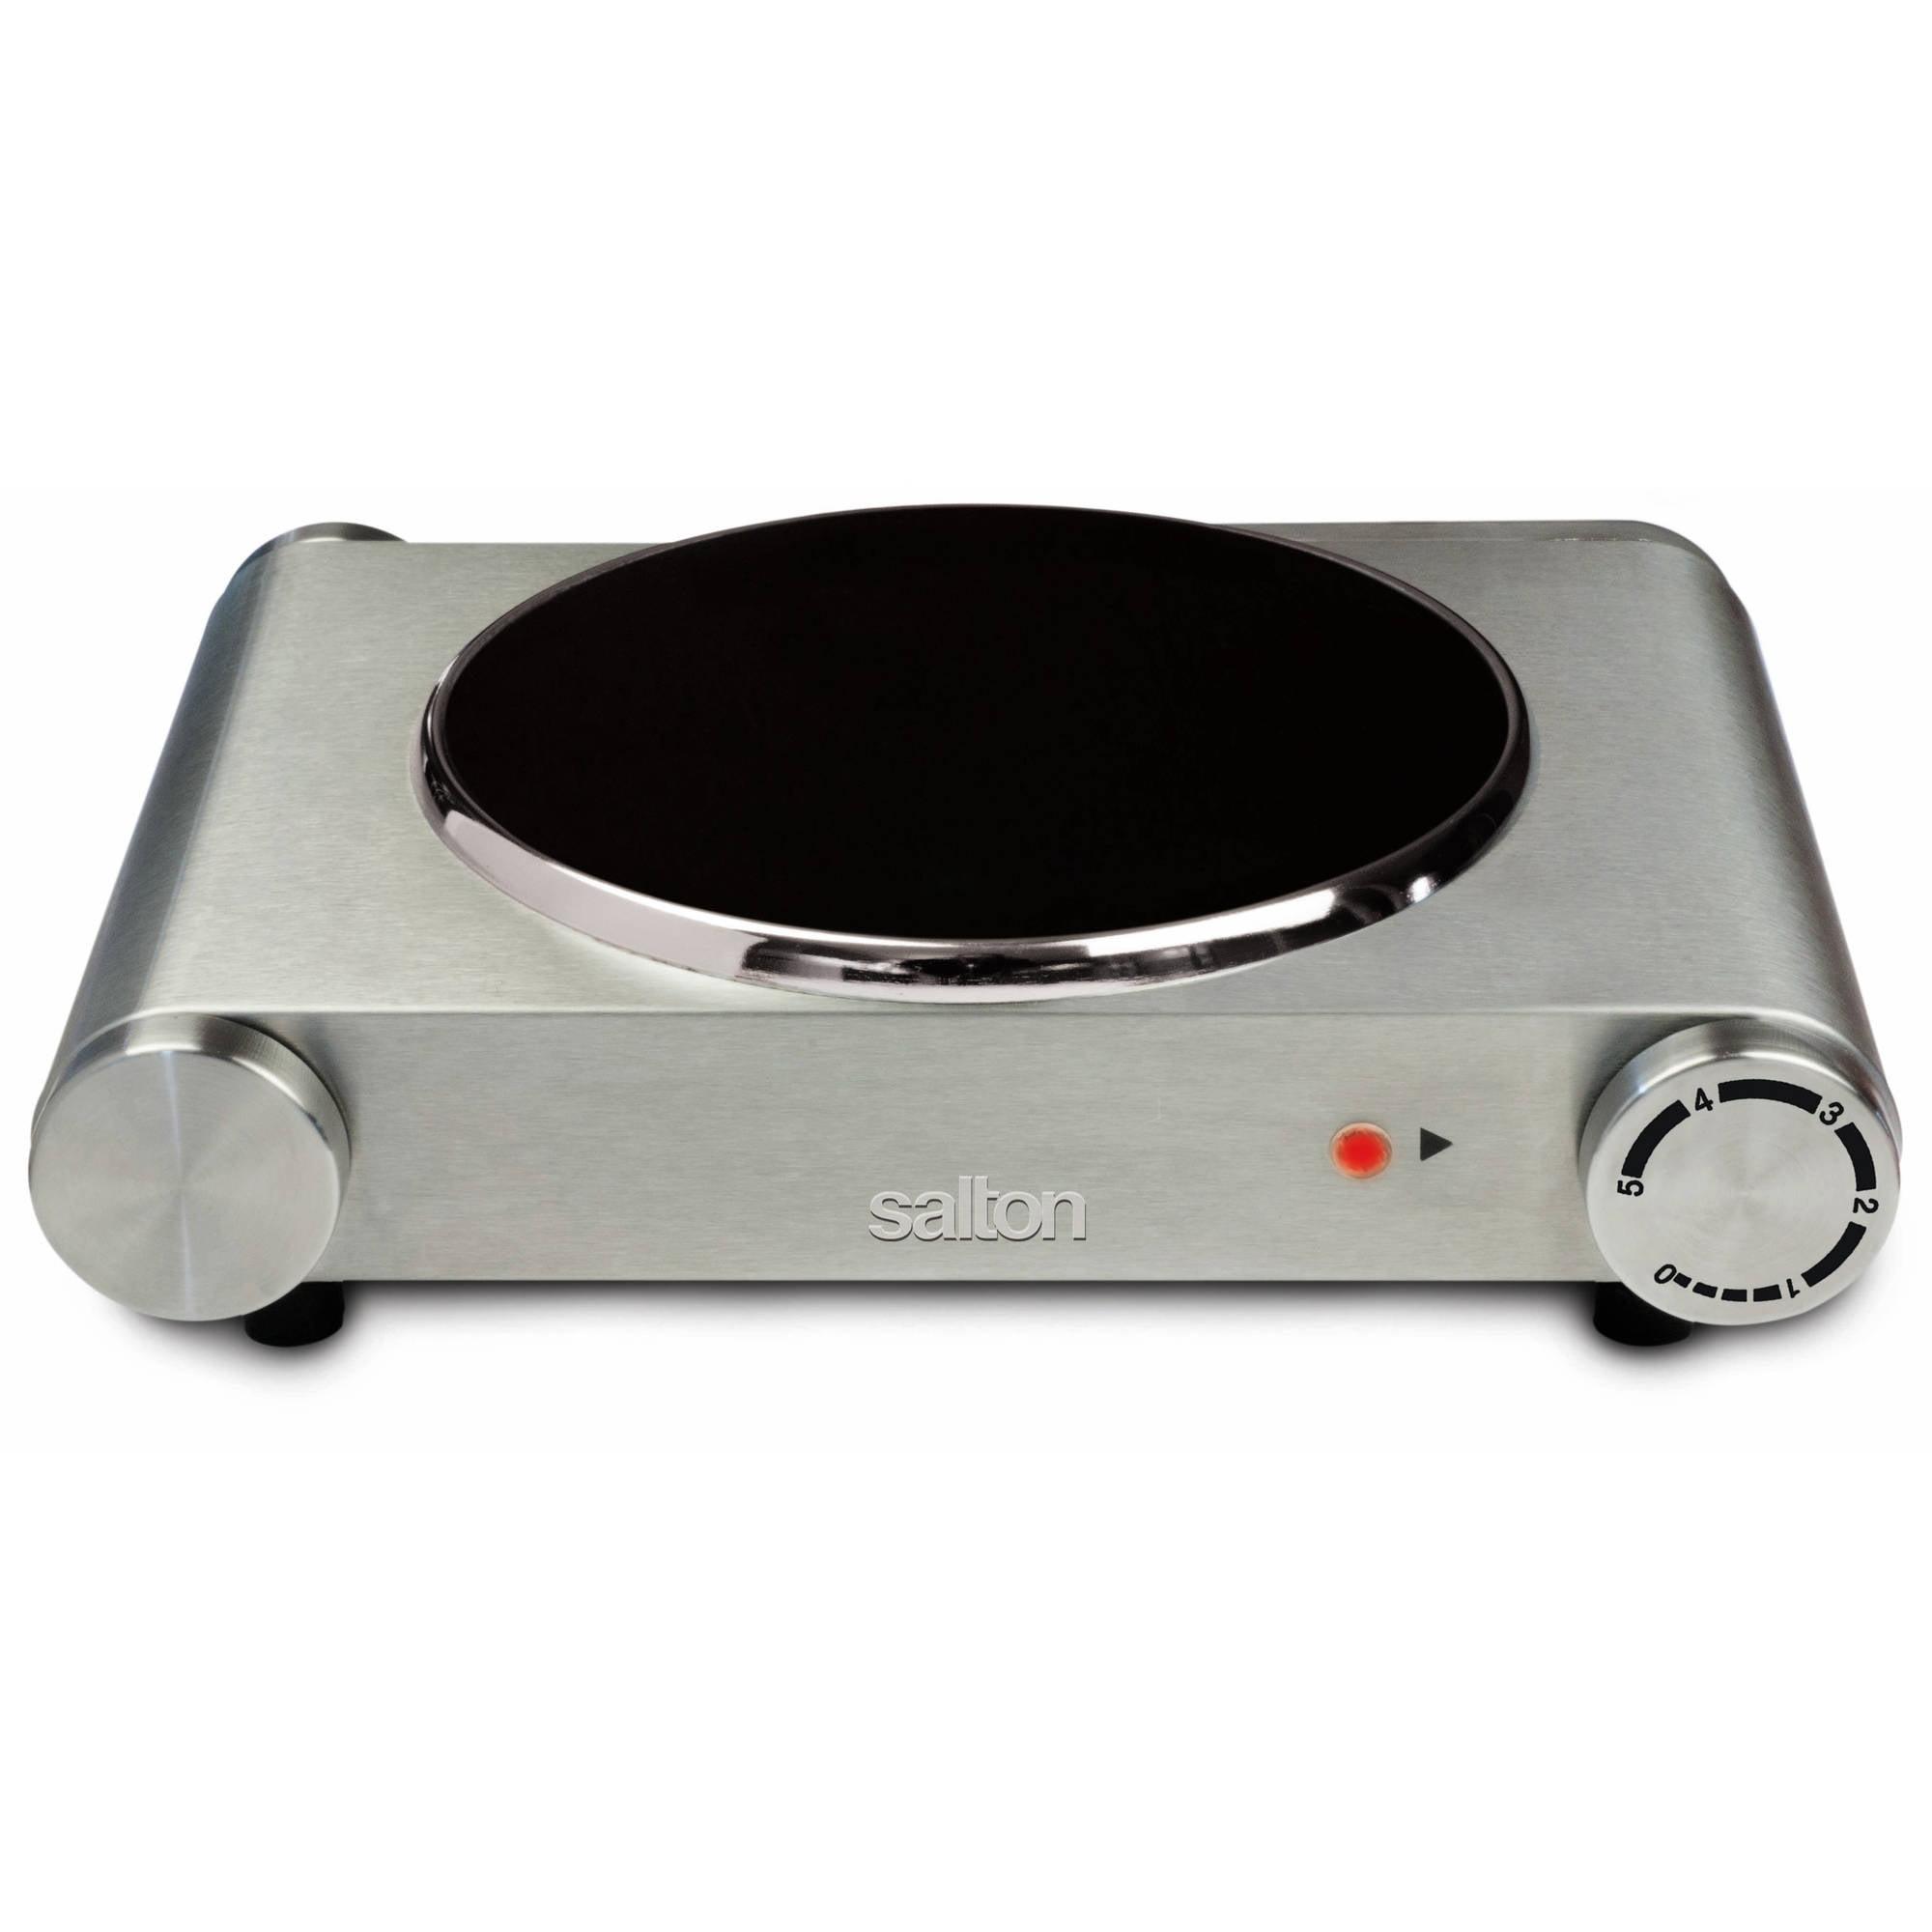 Salton Portable Infrared Cooktop, Single Burner